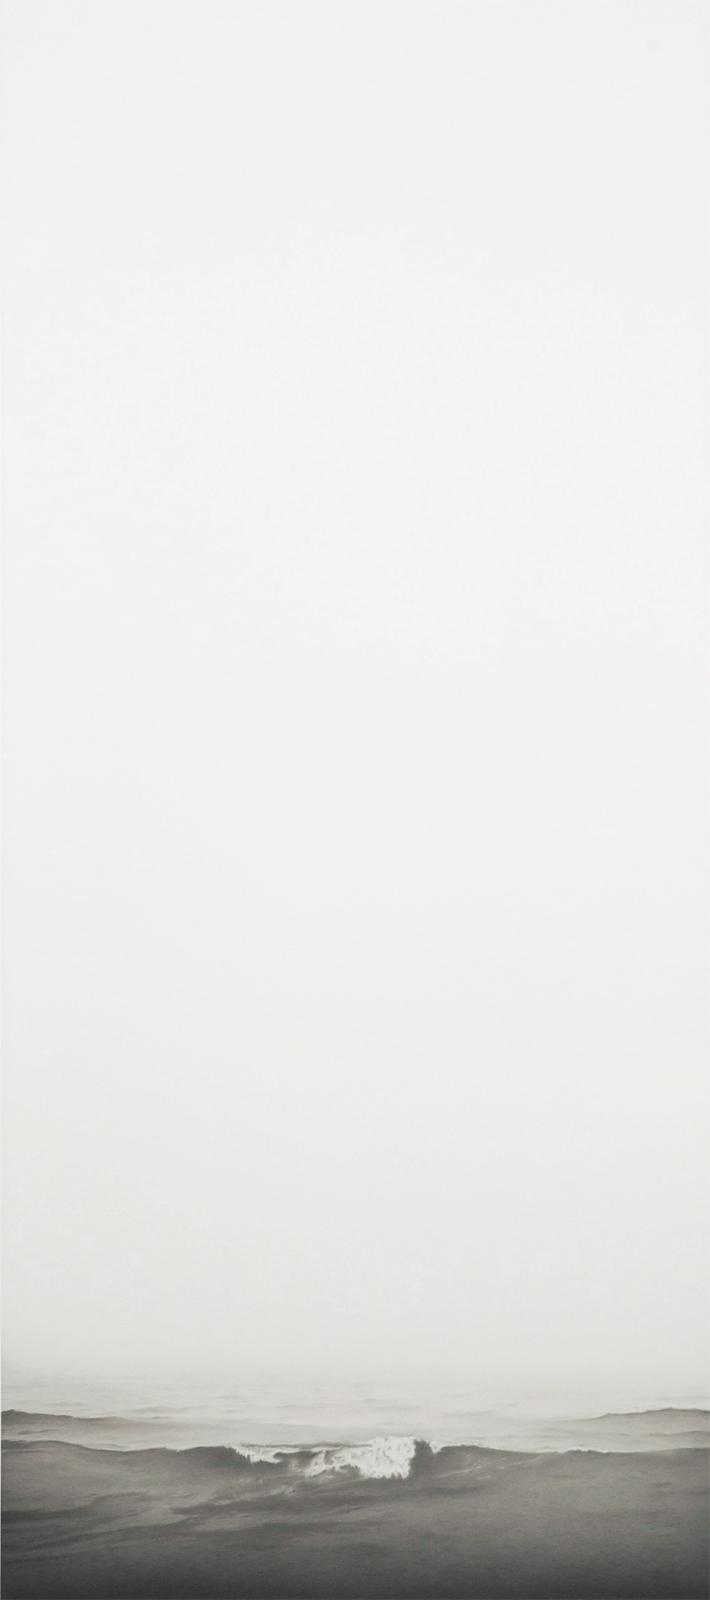 "Francisco Souto, ""Seascape #3 Barcelona, Spain,"" 2011, graphite on paper, 23 x 60 inches."